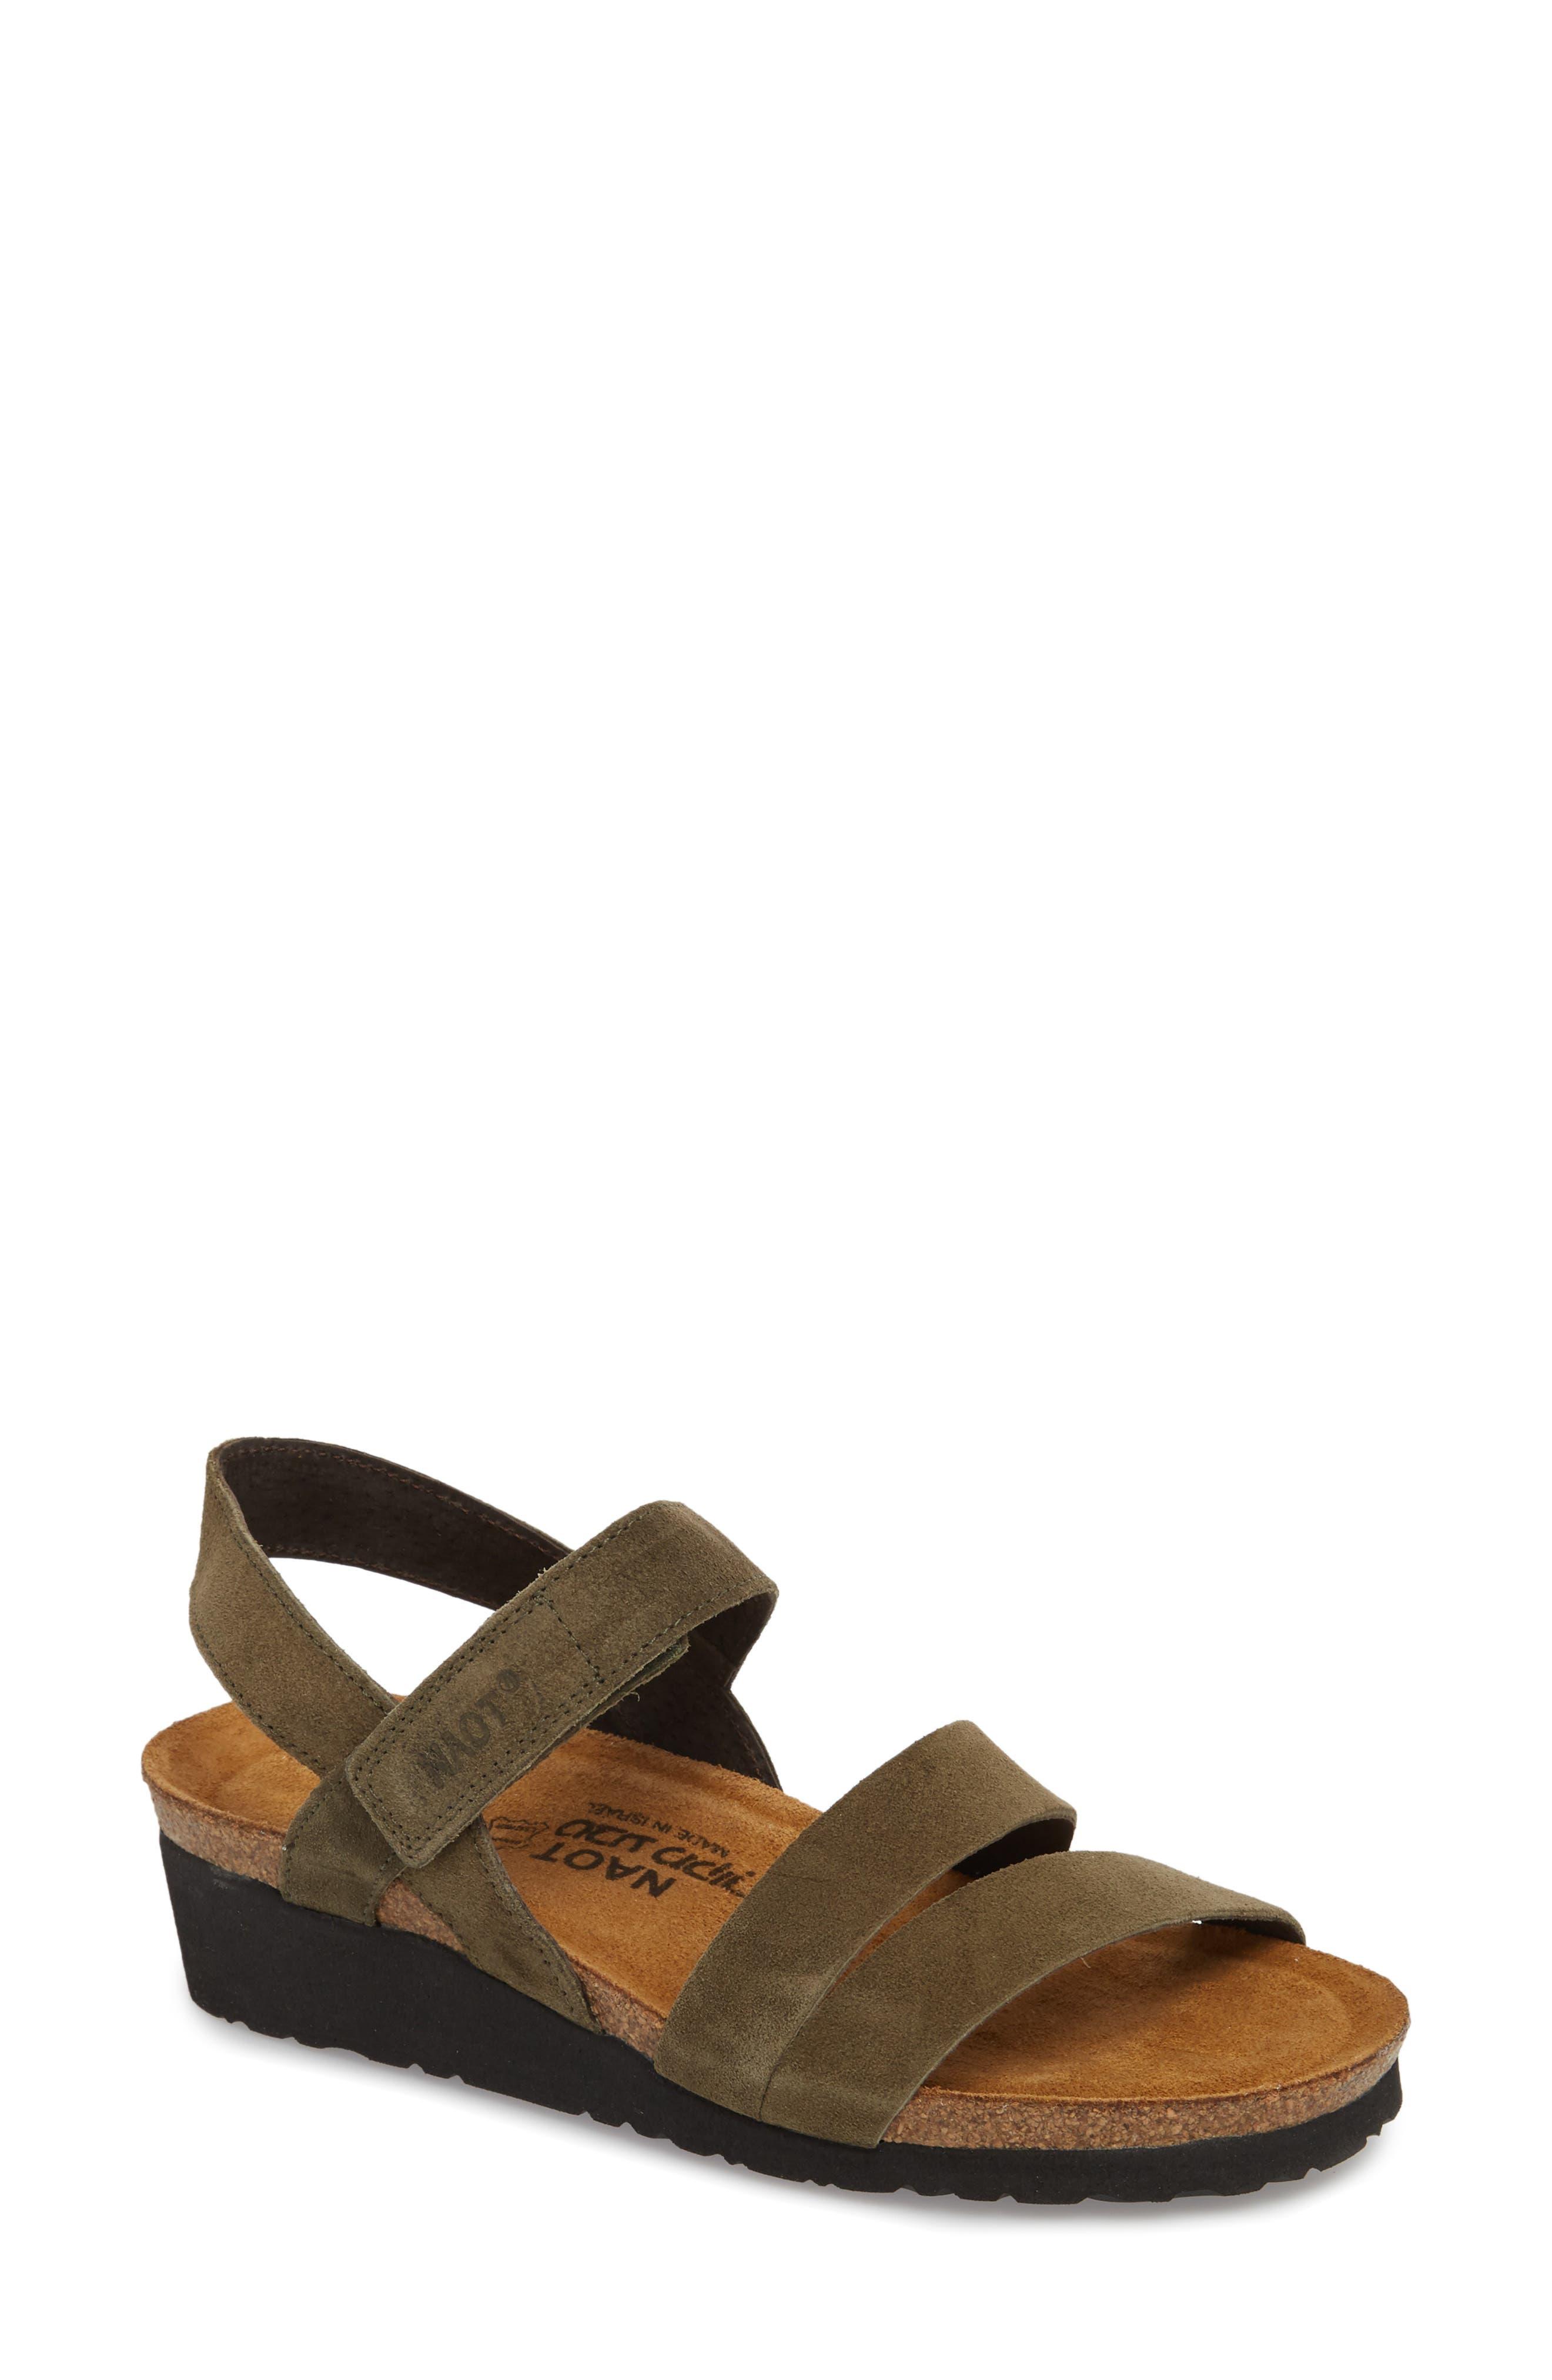 NAOT 'Kayla' Sandal, Main, color, OILY OLIVE SUEDE